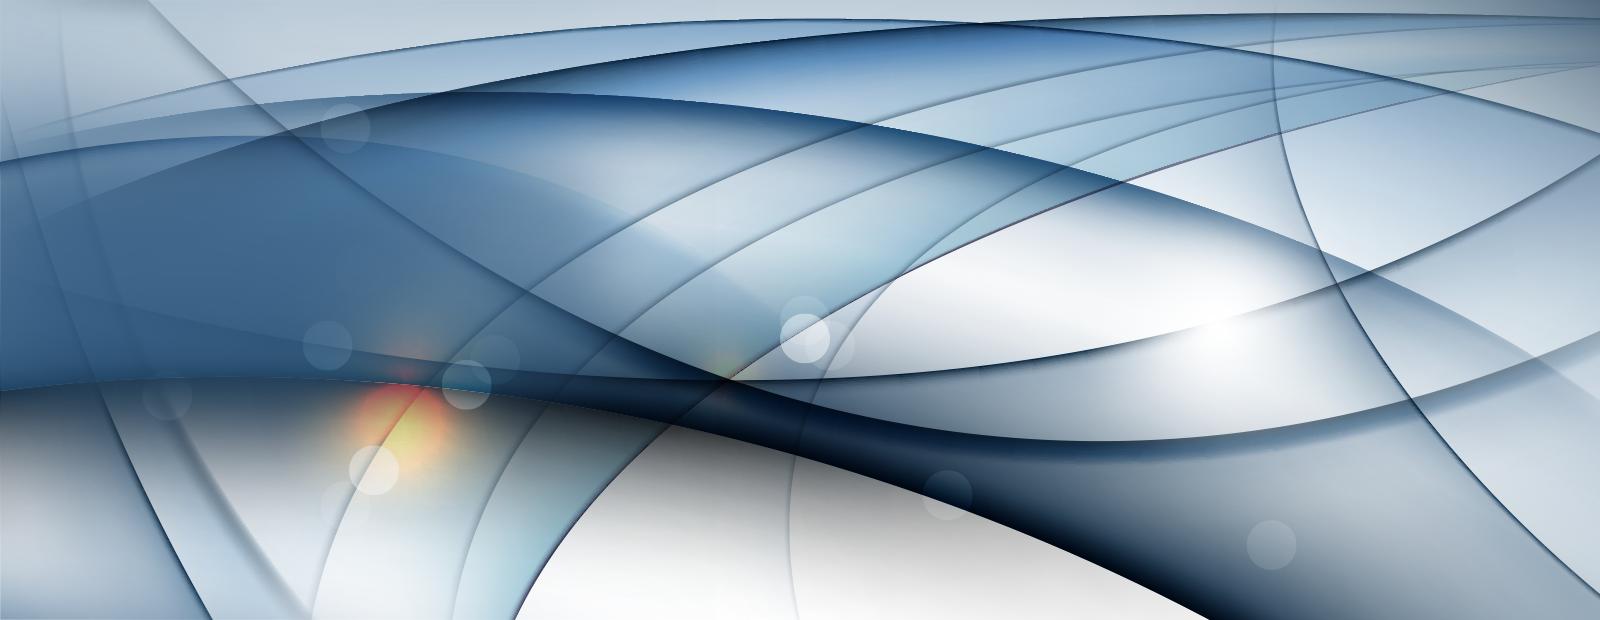 Torlon-AI-for-coatings-abstract